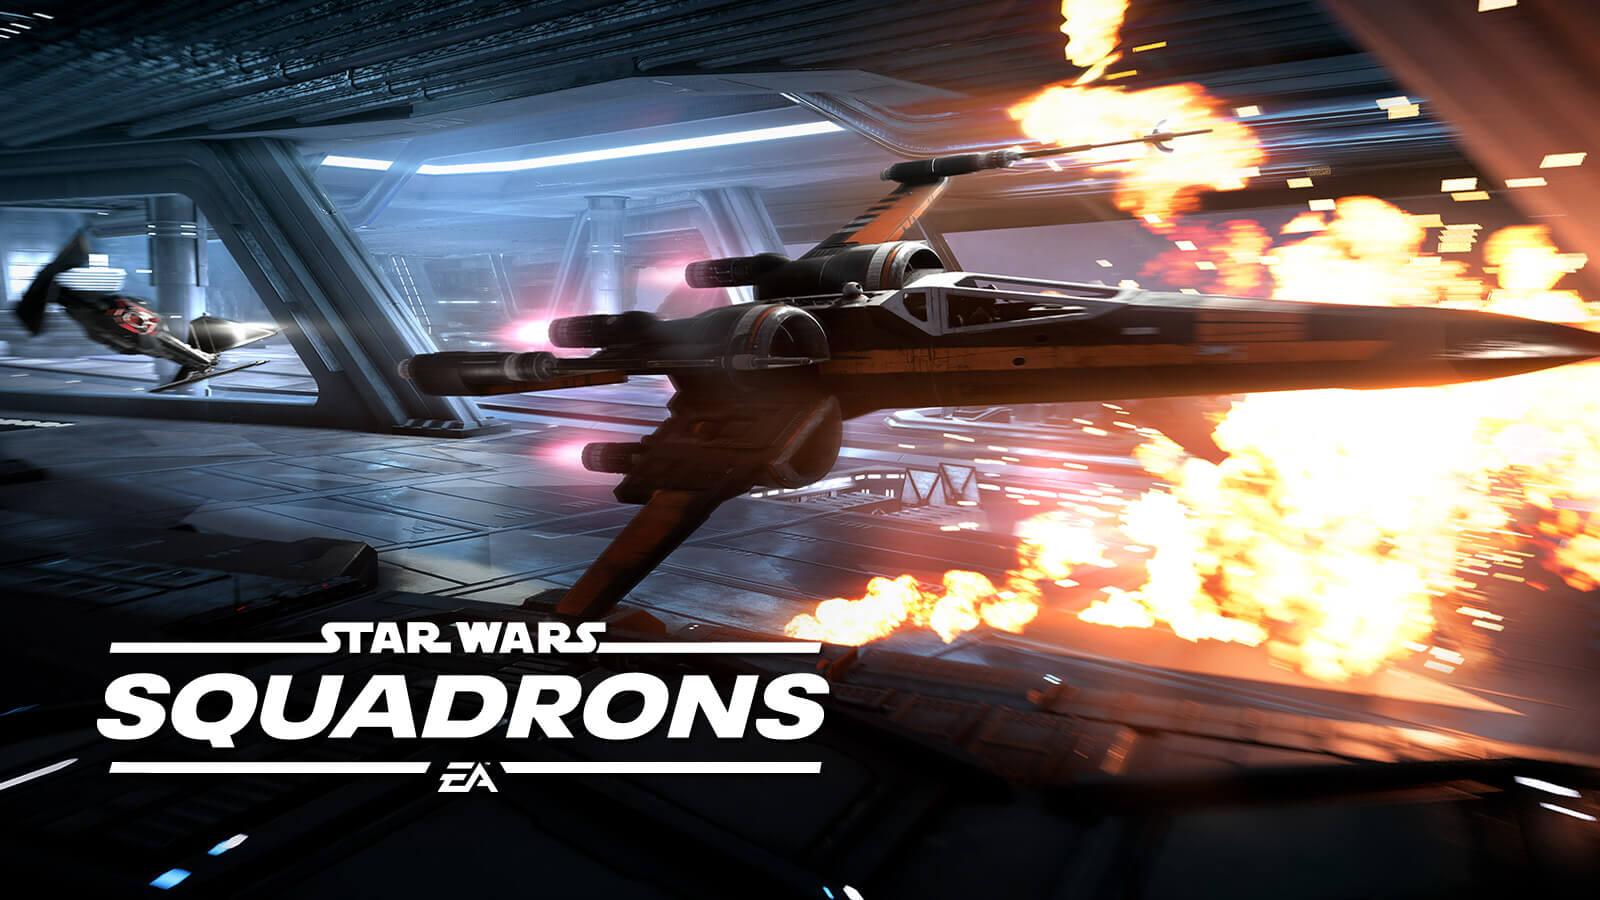 Star Wars %25E2%2580%2593 Squadrons Announced